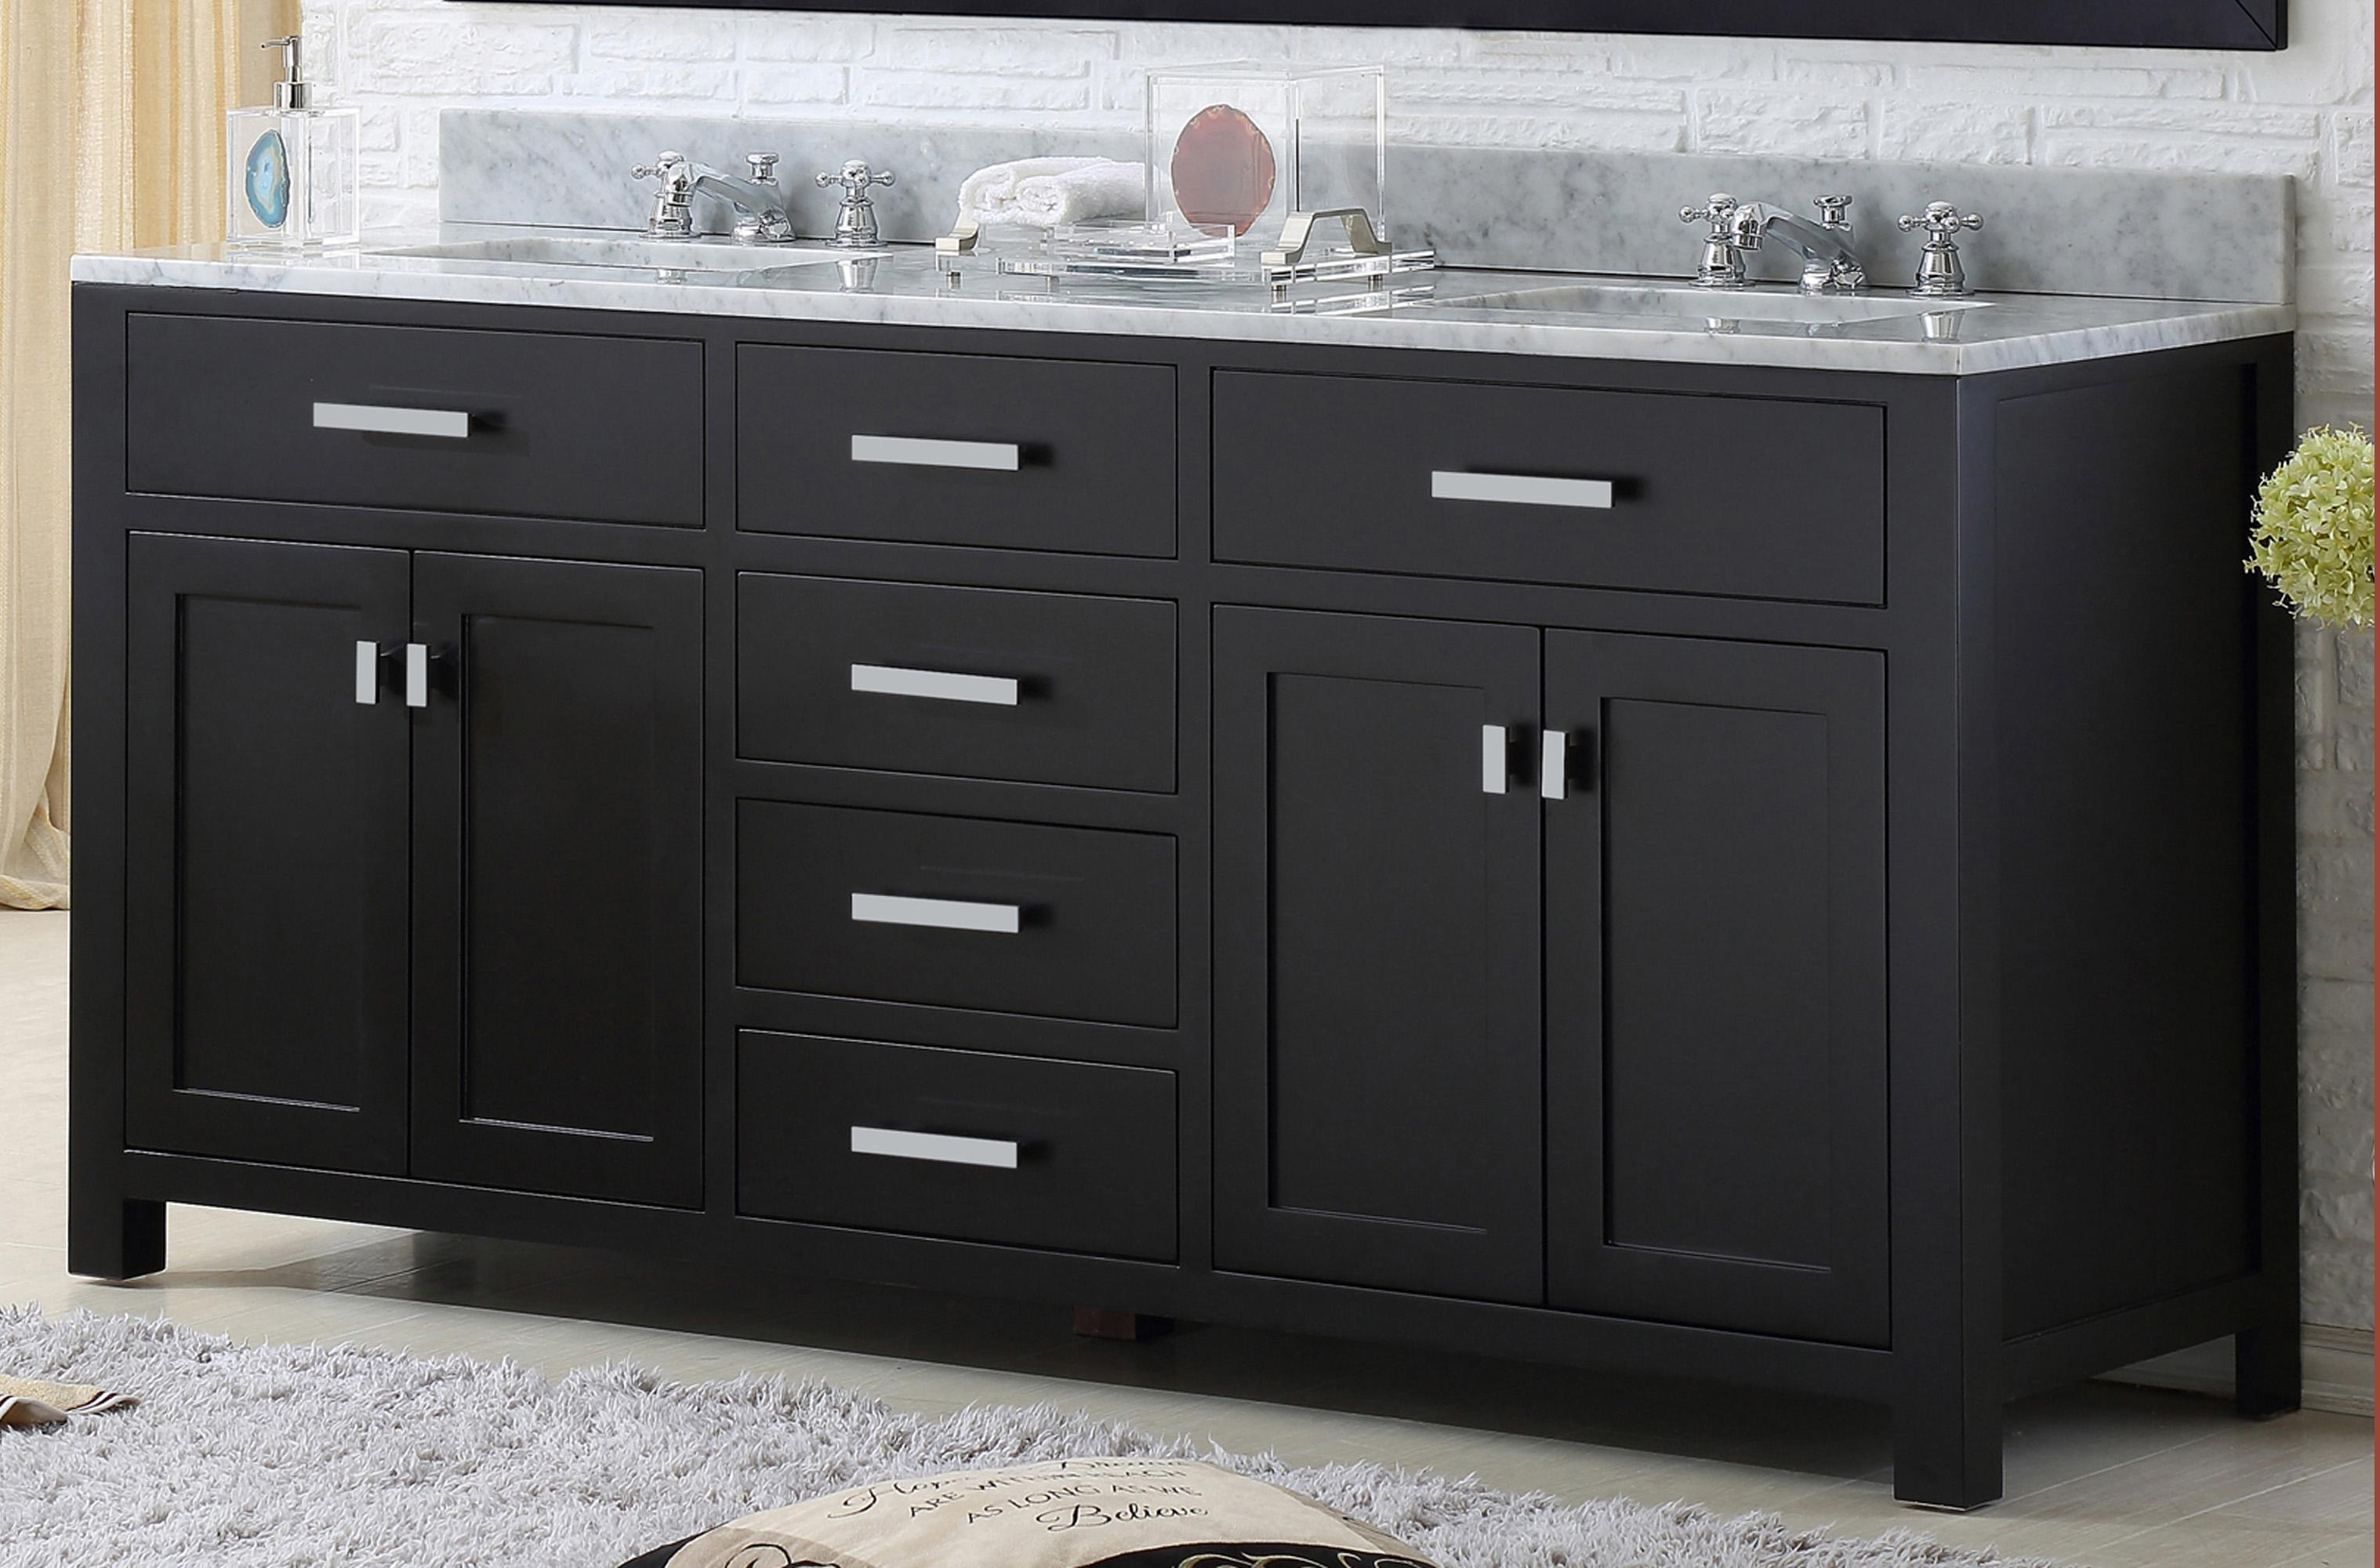 "60"" Espresso Double Sink Bathroom Vanity with White Carrara Marble Top"